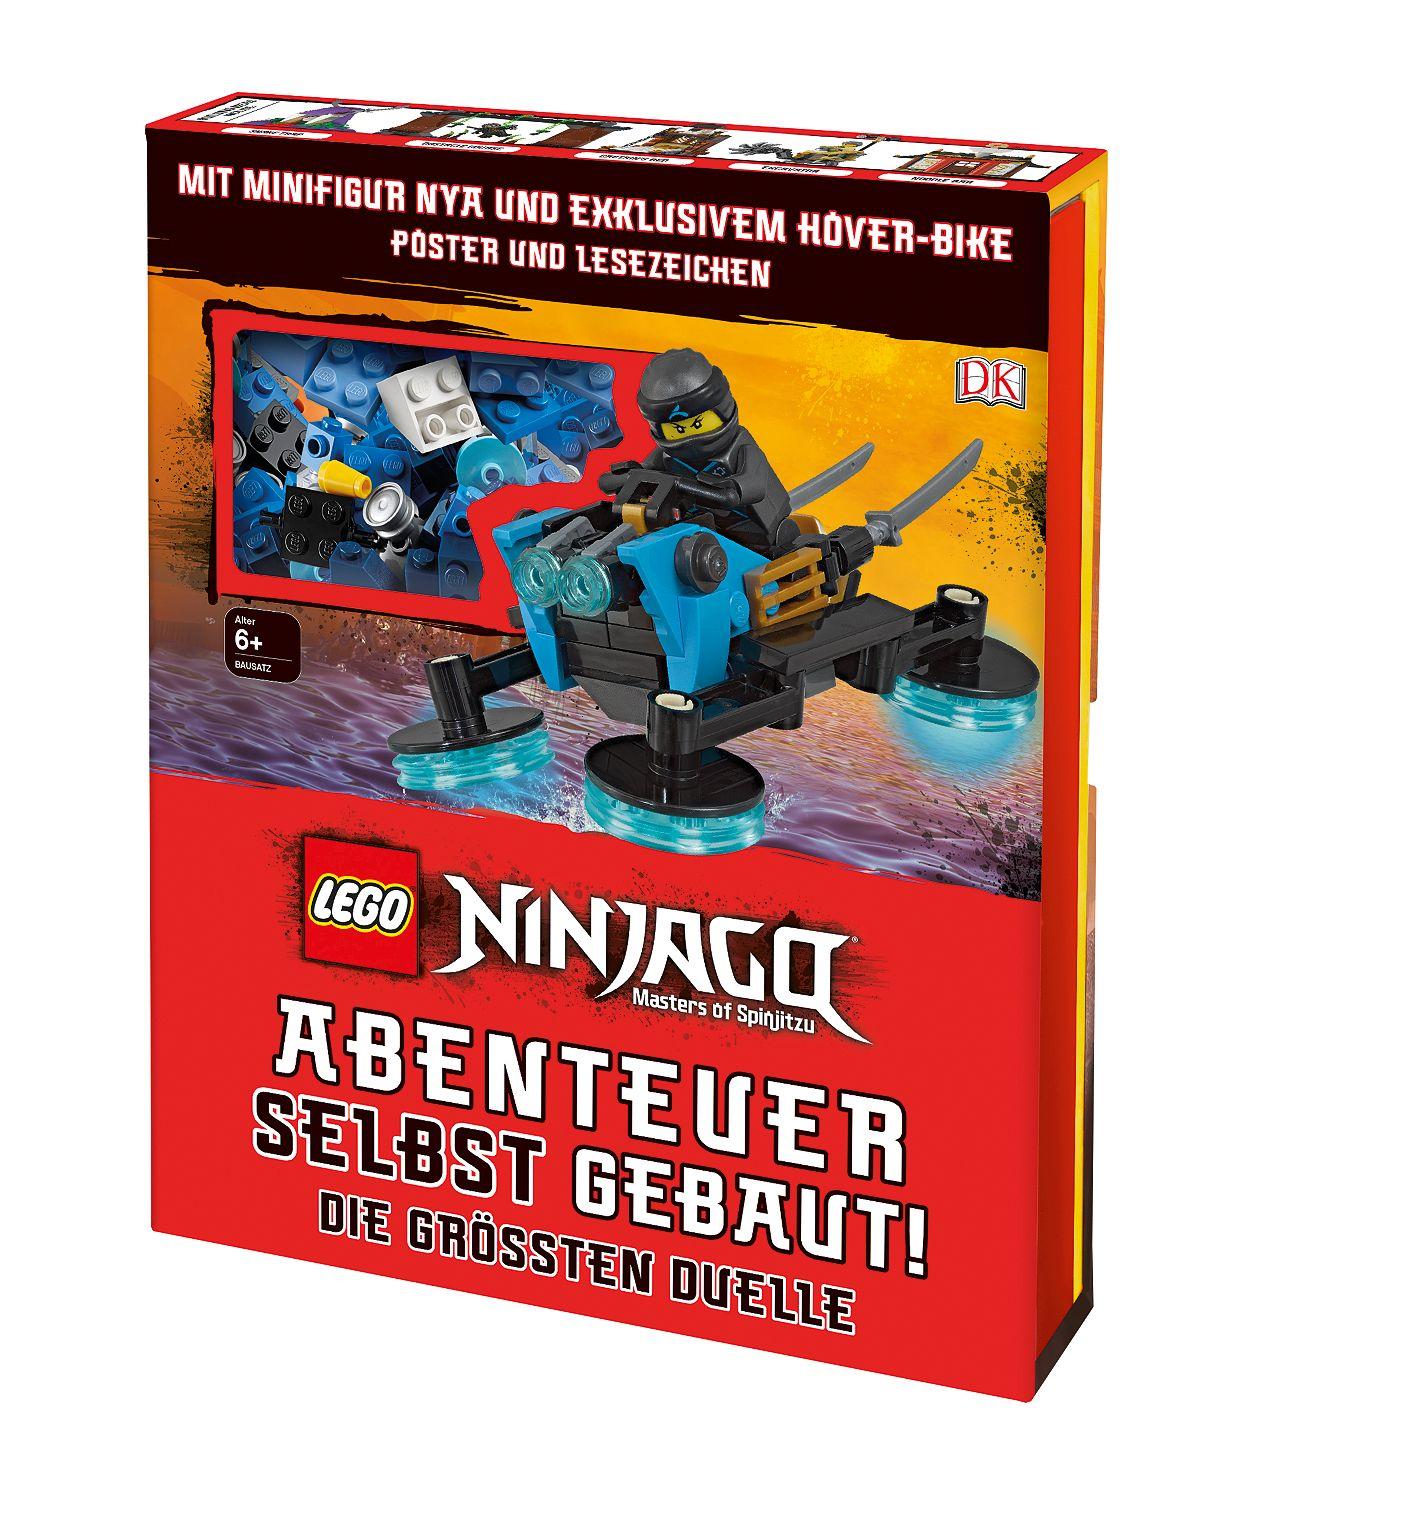 LEGO® NINJAGO® Abenteuer selbst gebaut!